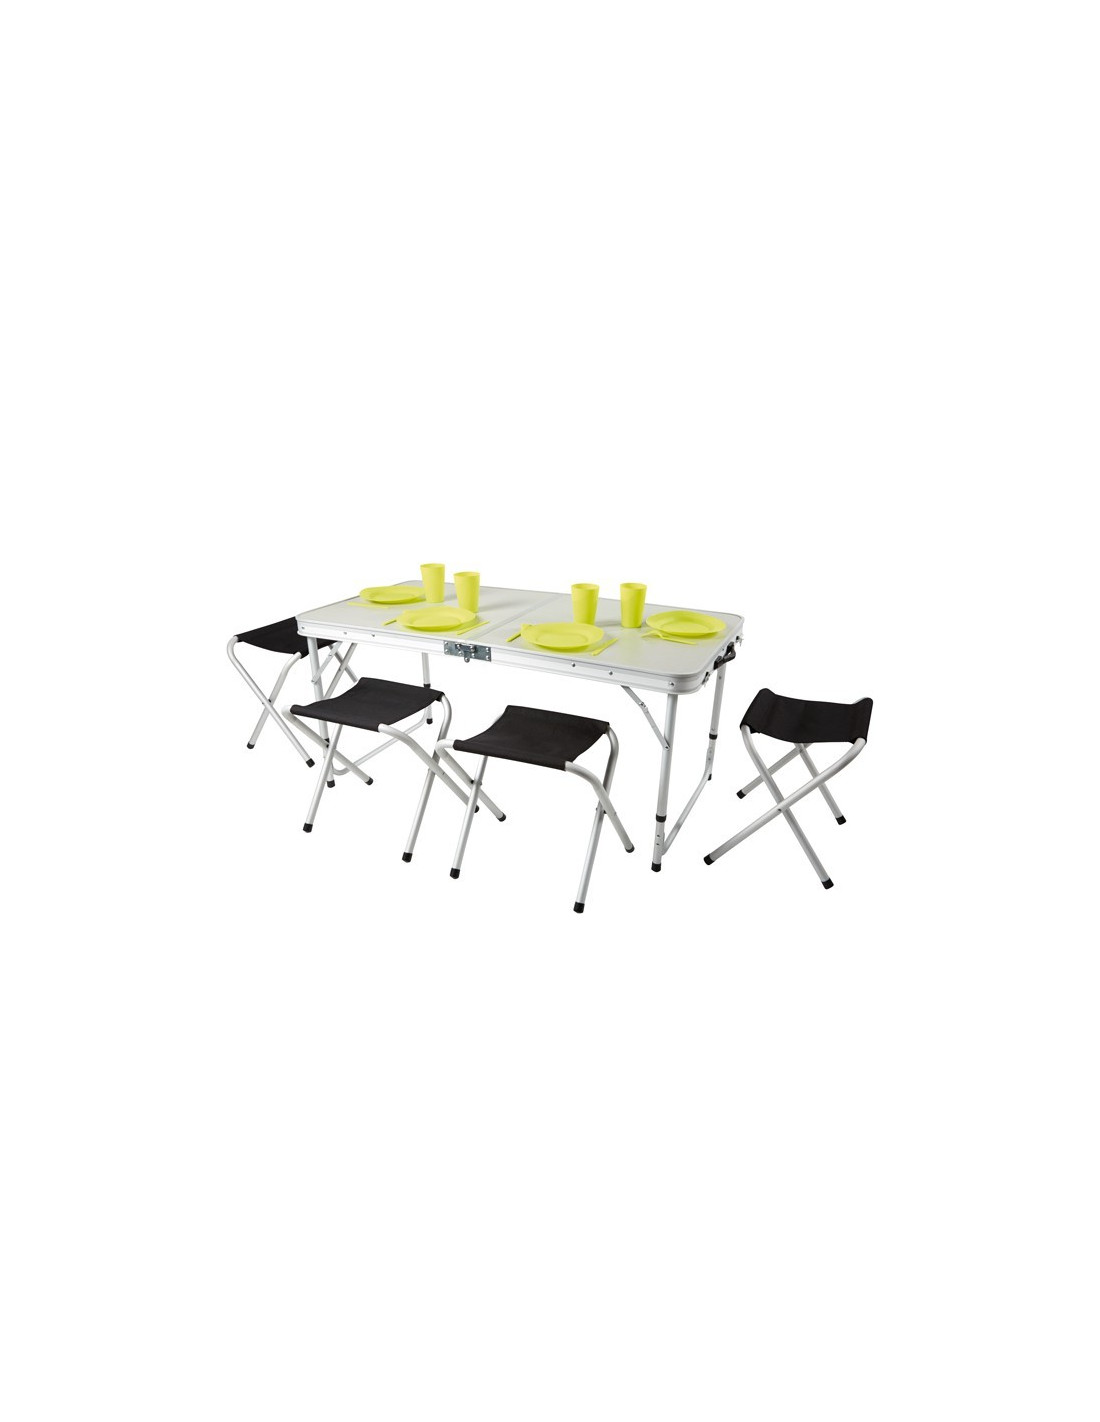 table valise pique nique et 4 tabourets hyper brico. Black Bedroom Furniture Sets. Home Design Ideas